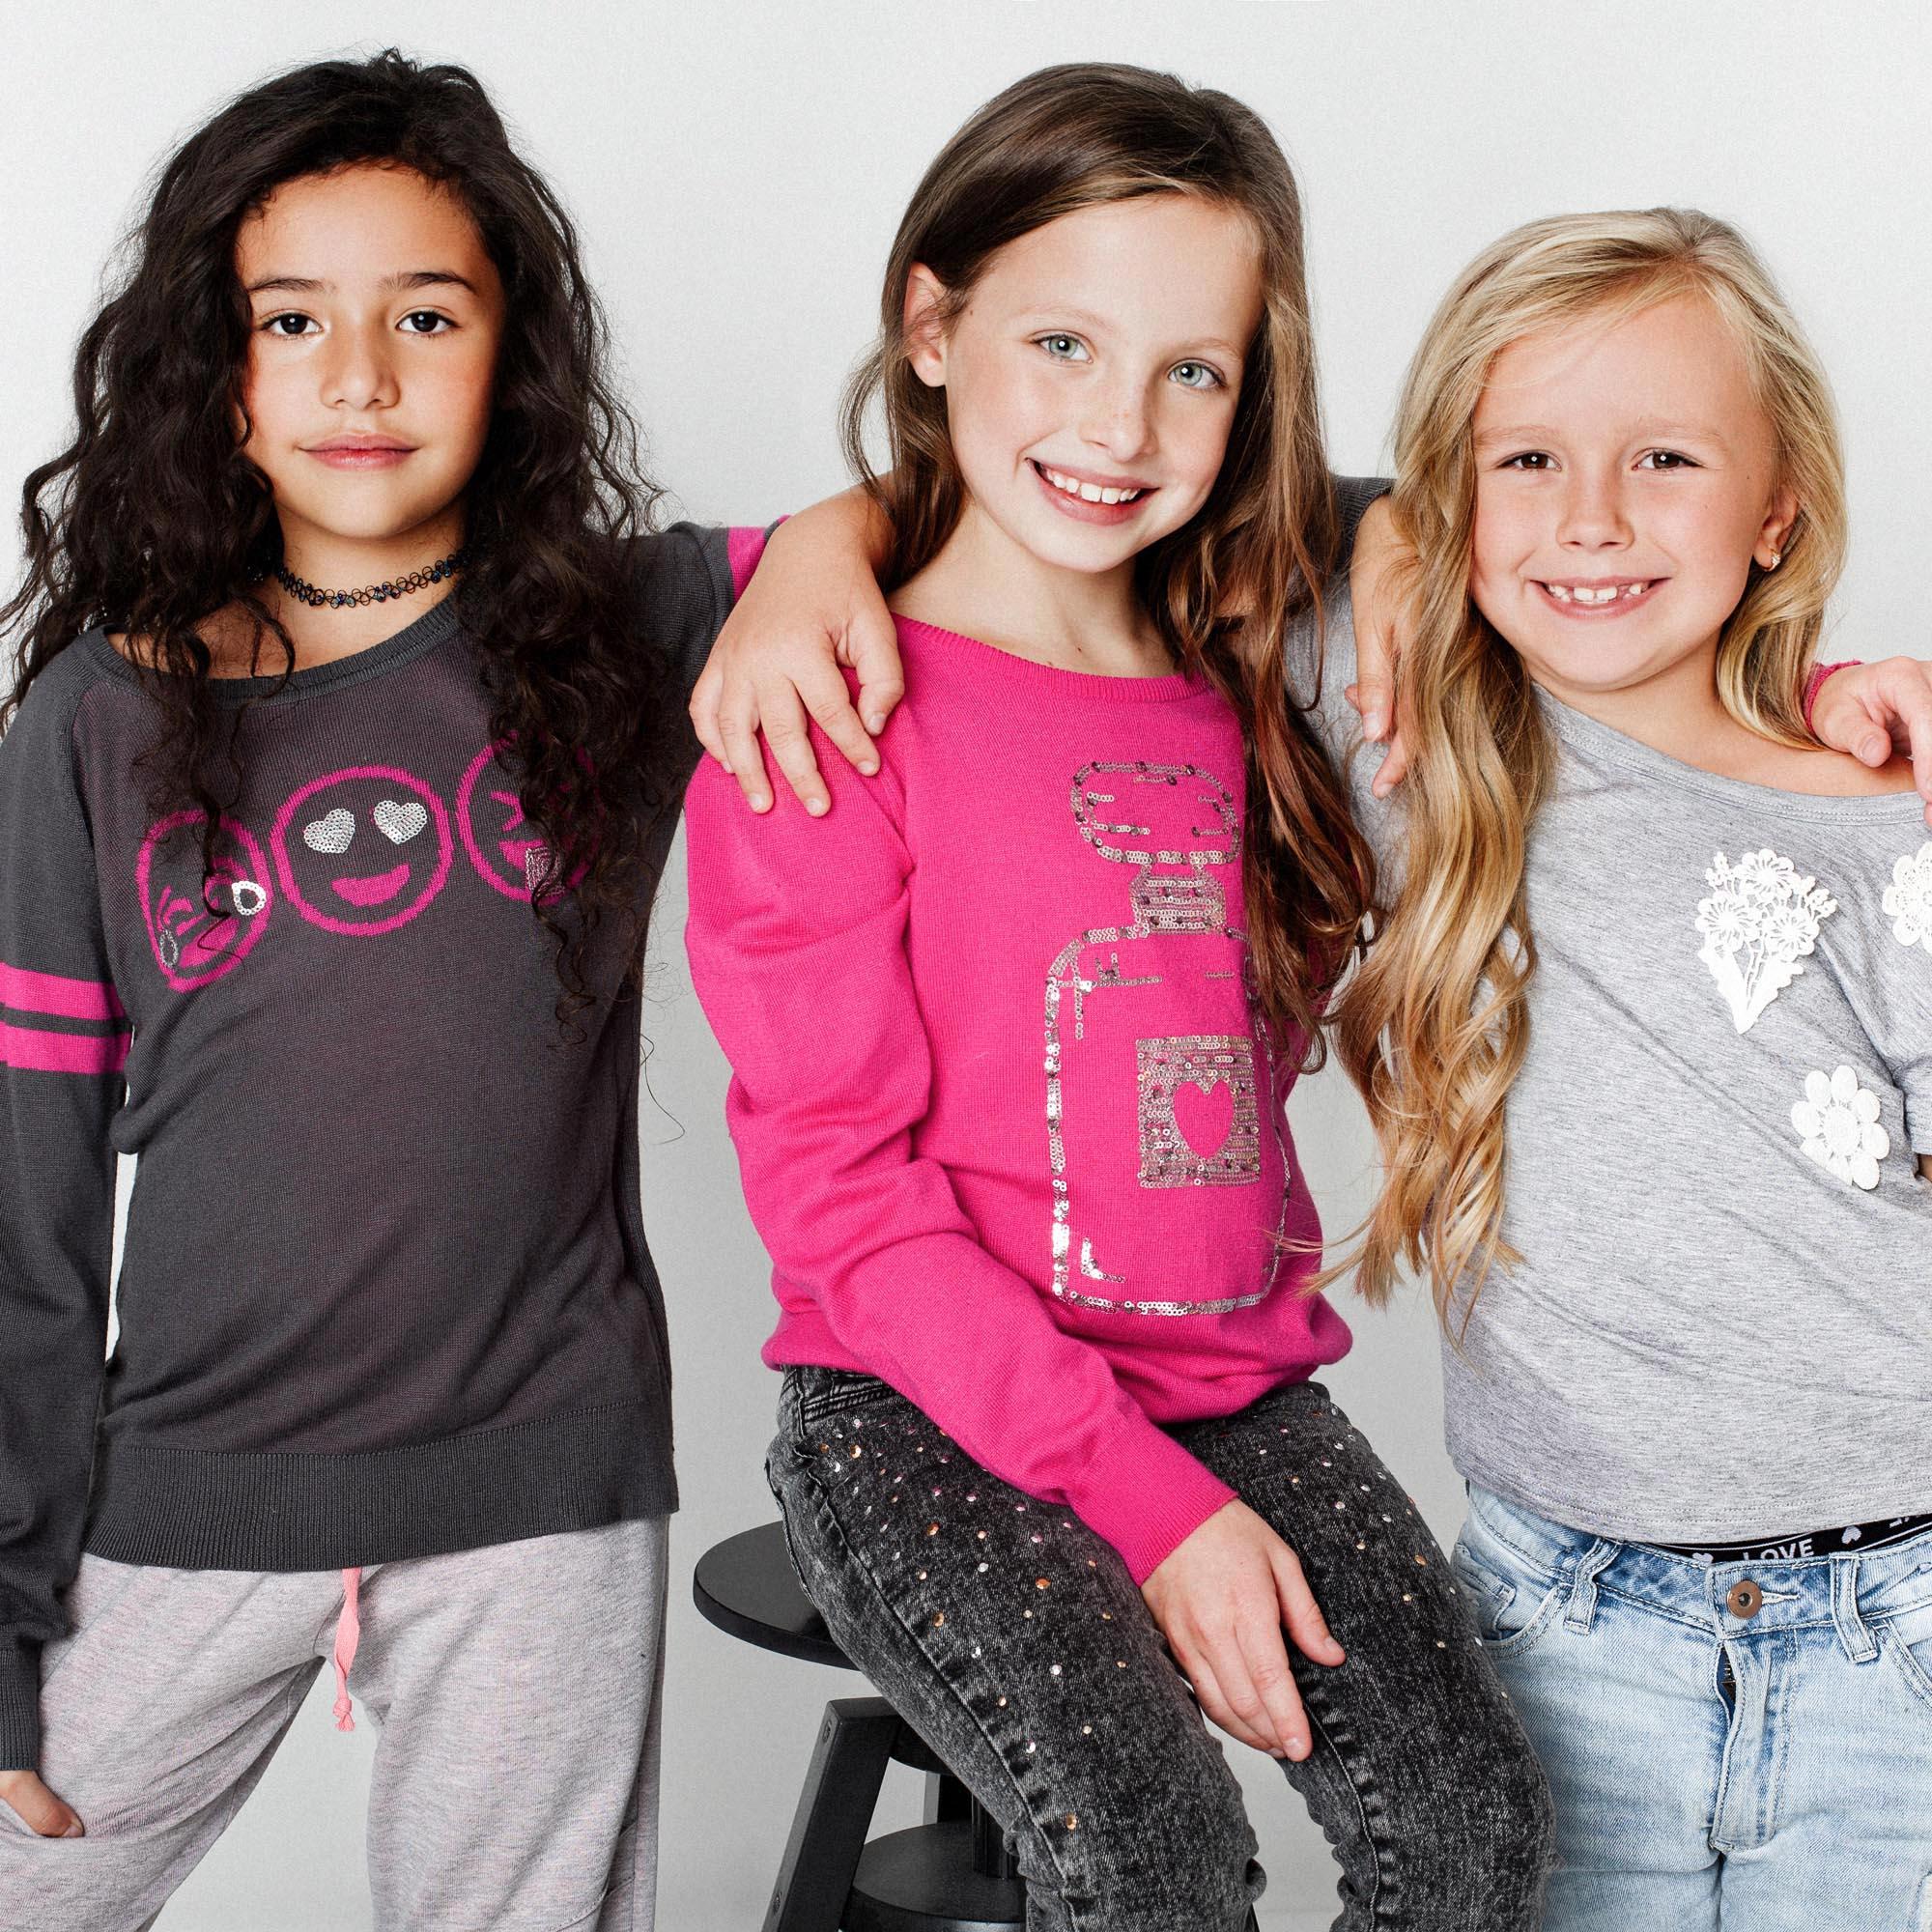 nyc-photographers-kids-modeling-100092.jpg